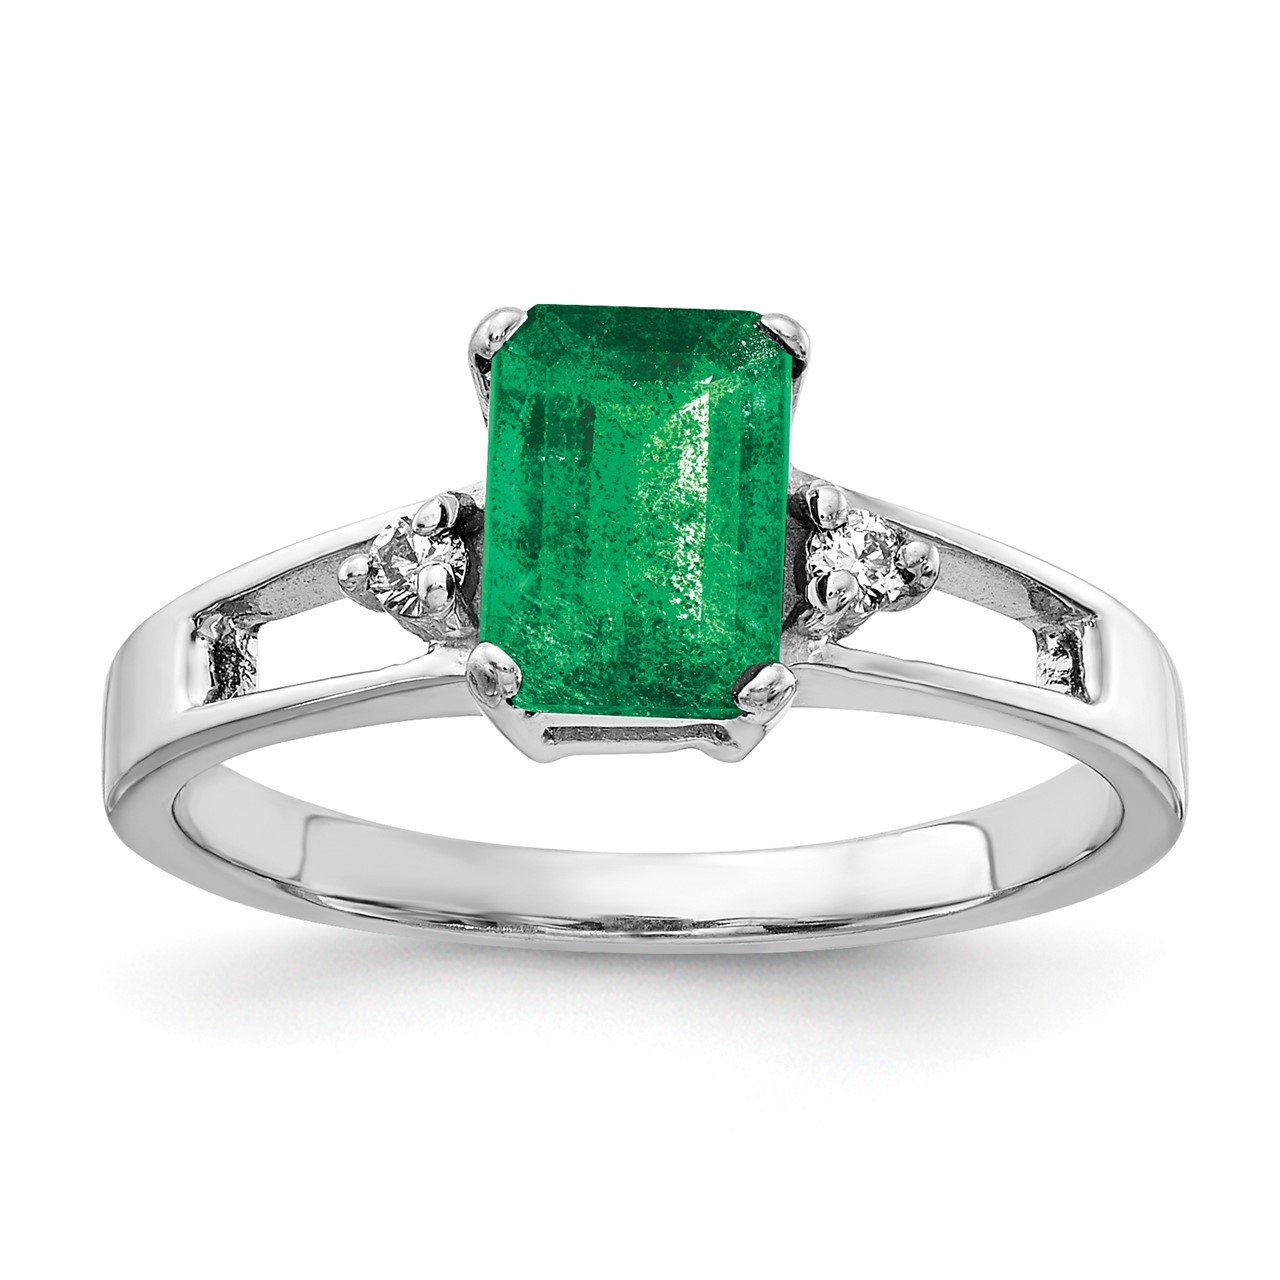 14k White Gold 7x5mm Emerald Cut Emerald AA Diamond ring